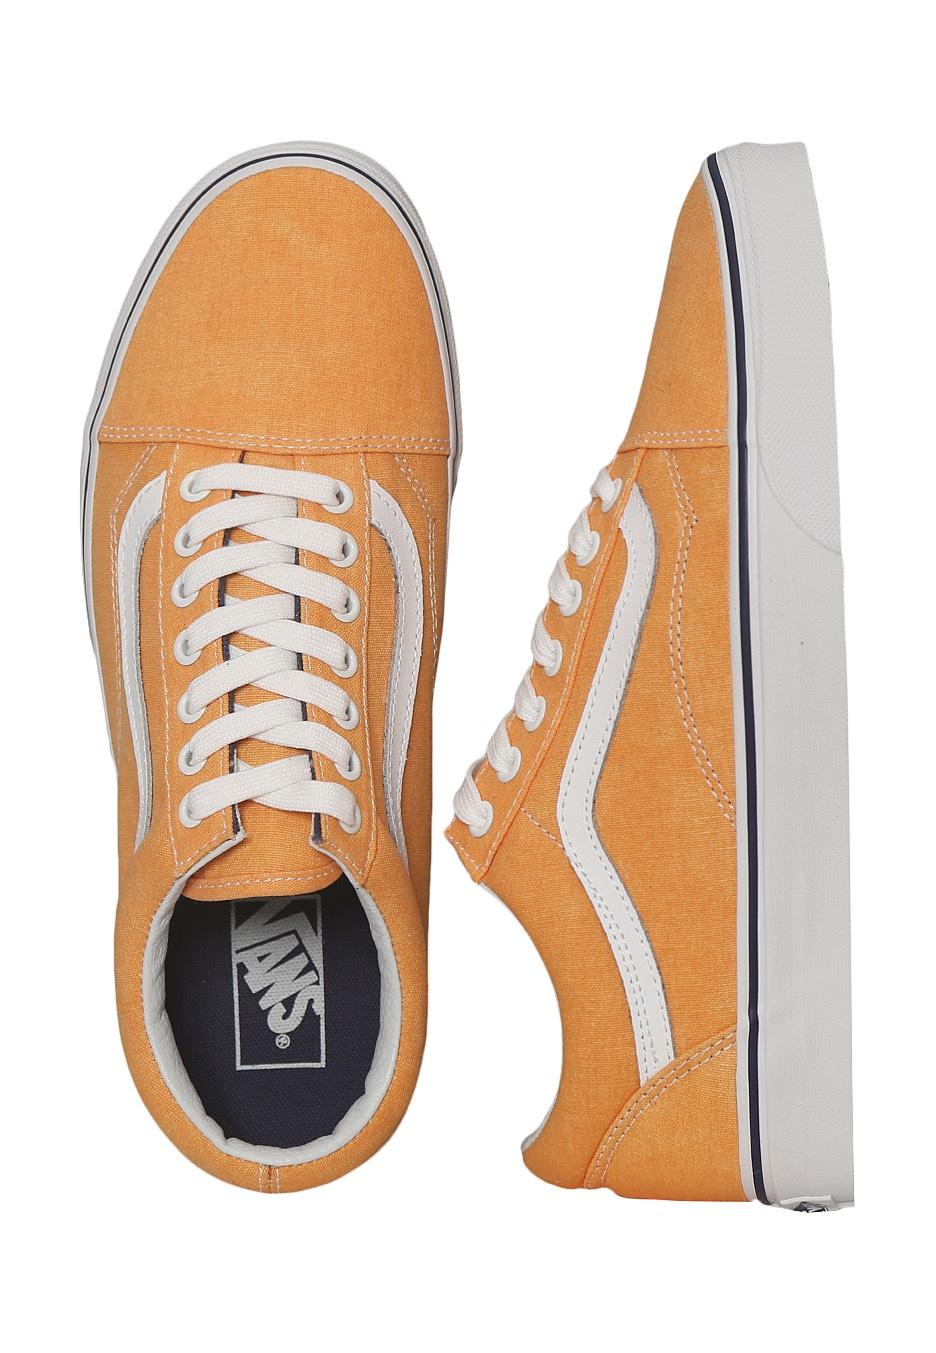 91421a0d9402 Vans - Old Skool Washed Canvas Citrus Crown Blue - Shoes - Impericon.com UK